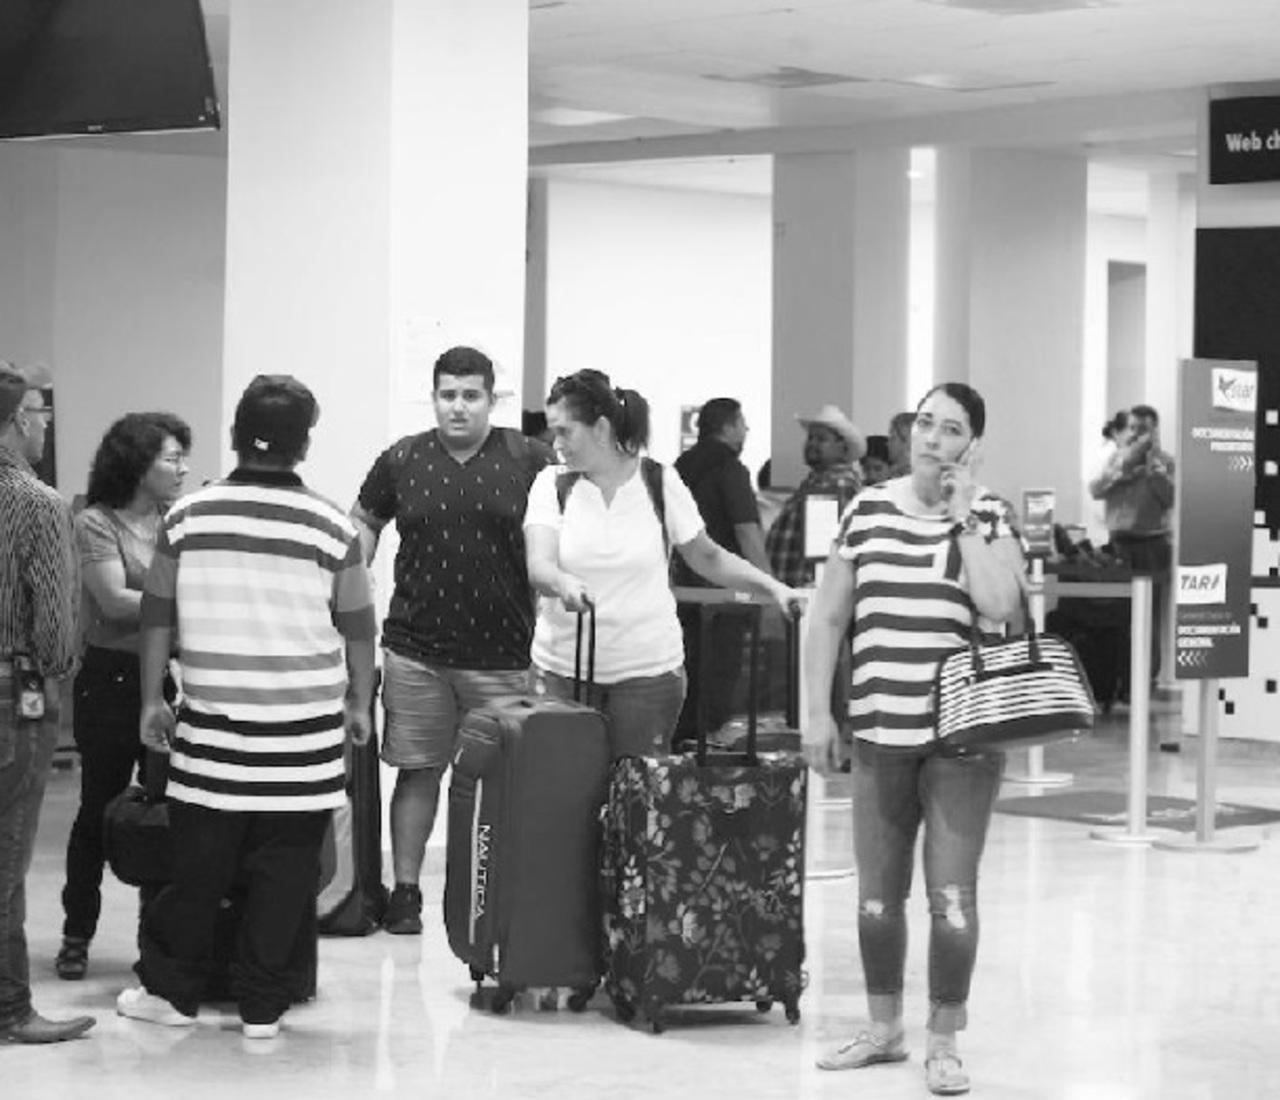 Abrirán vuelos temporales a Tijuana